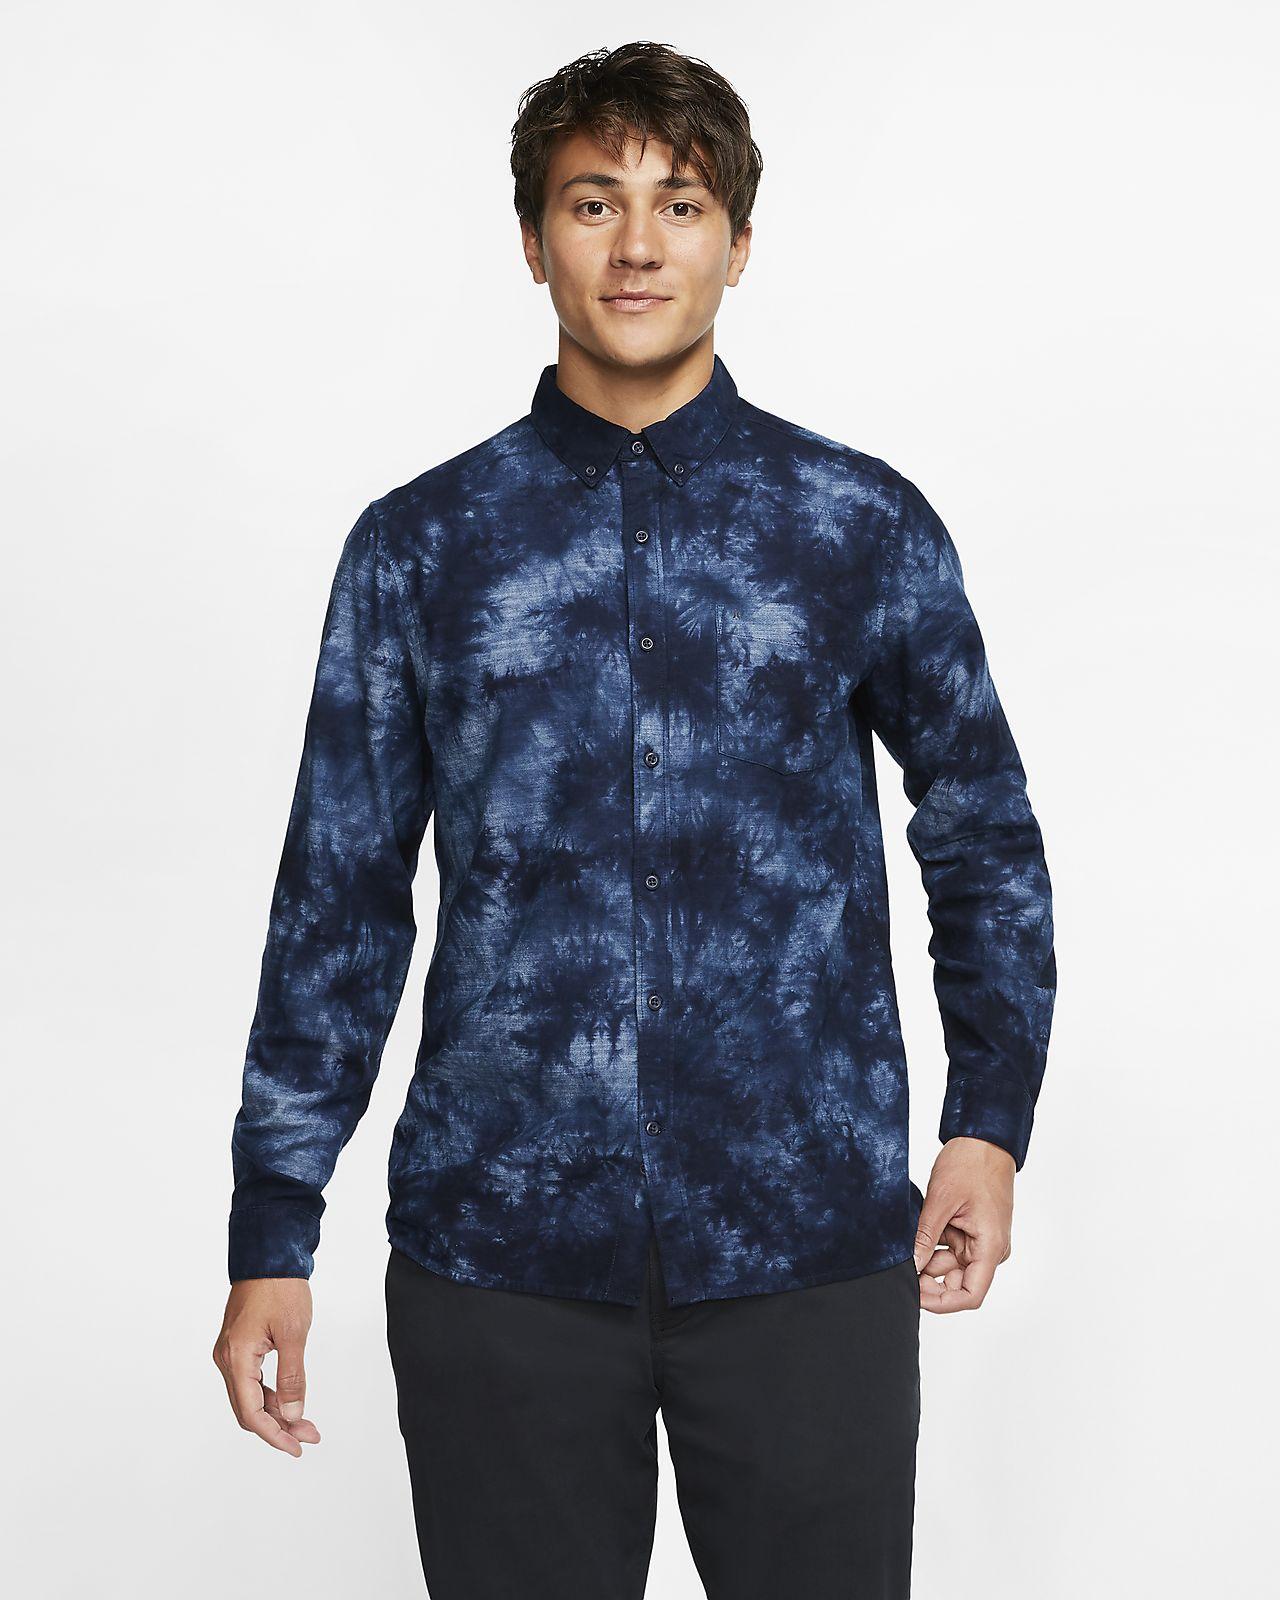 Hurley Jerry Men's Long-Sleeve Woven Top